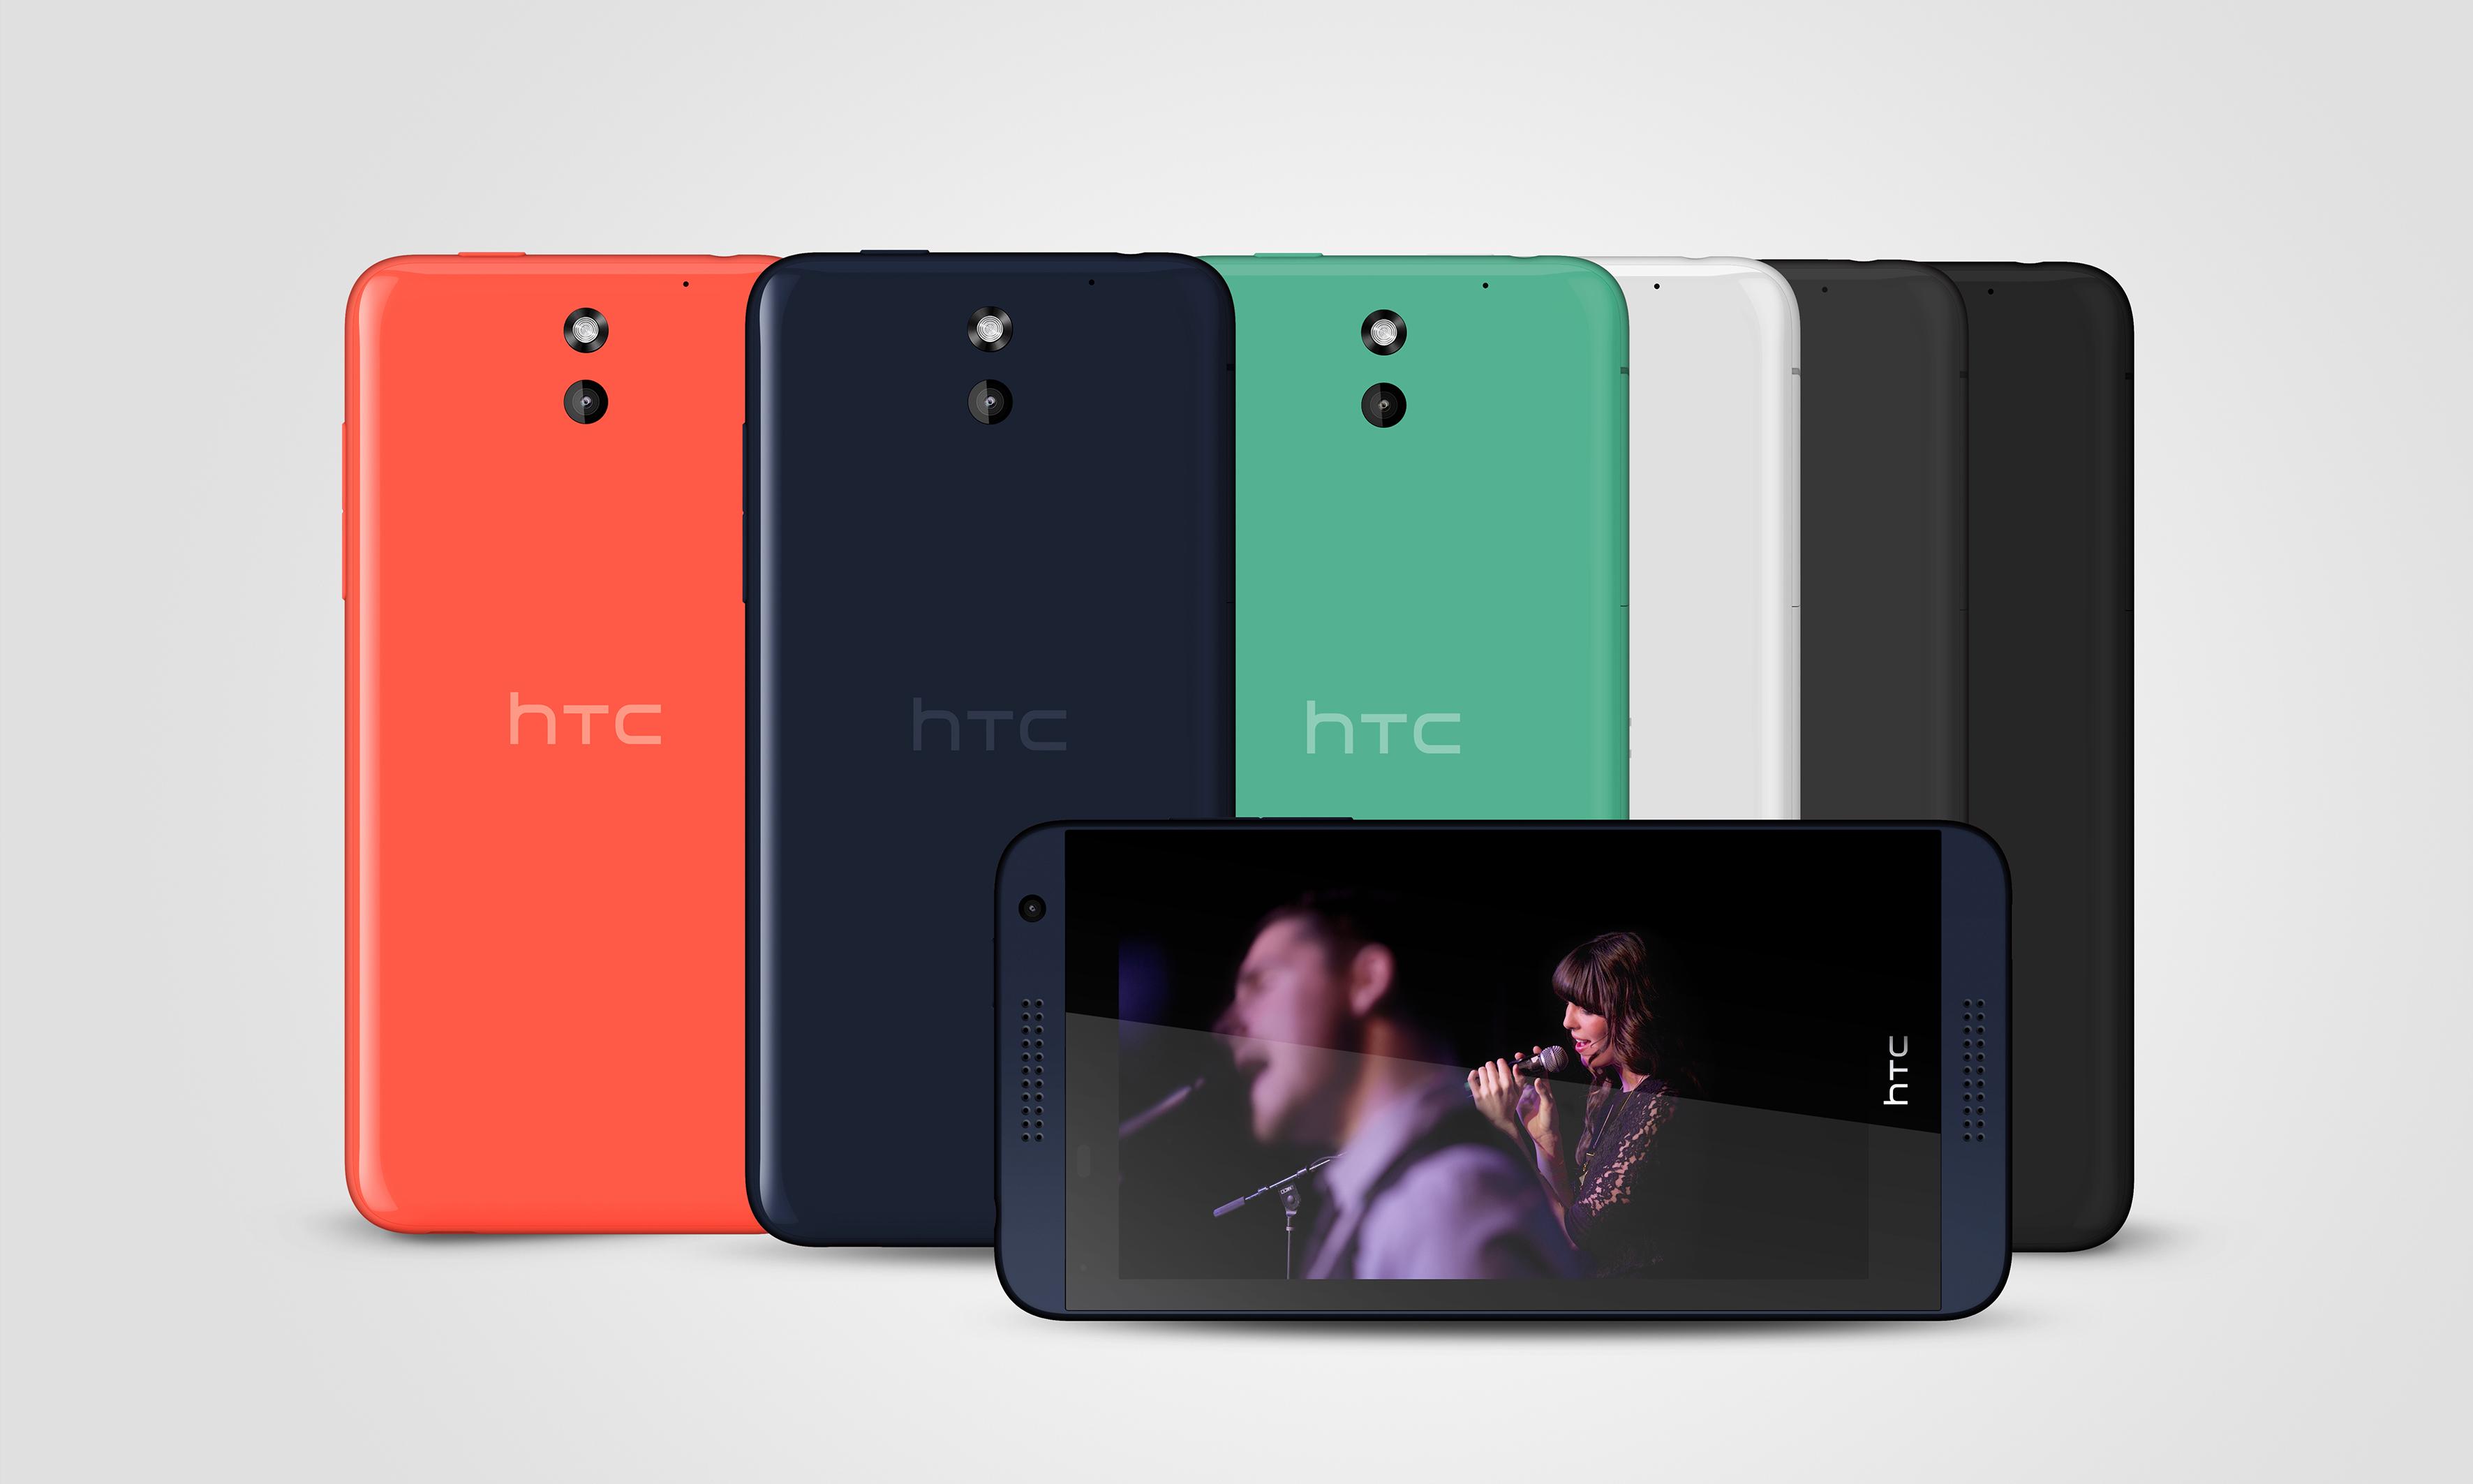 HTC Desire 610 All Colors